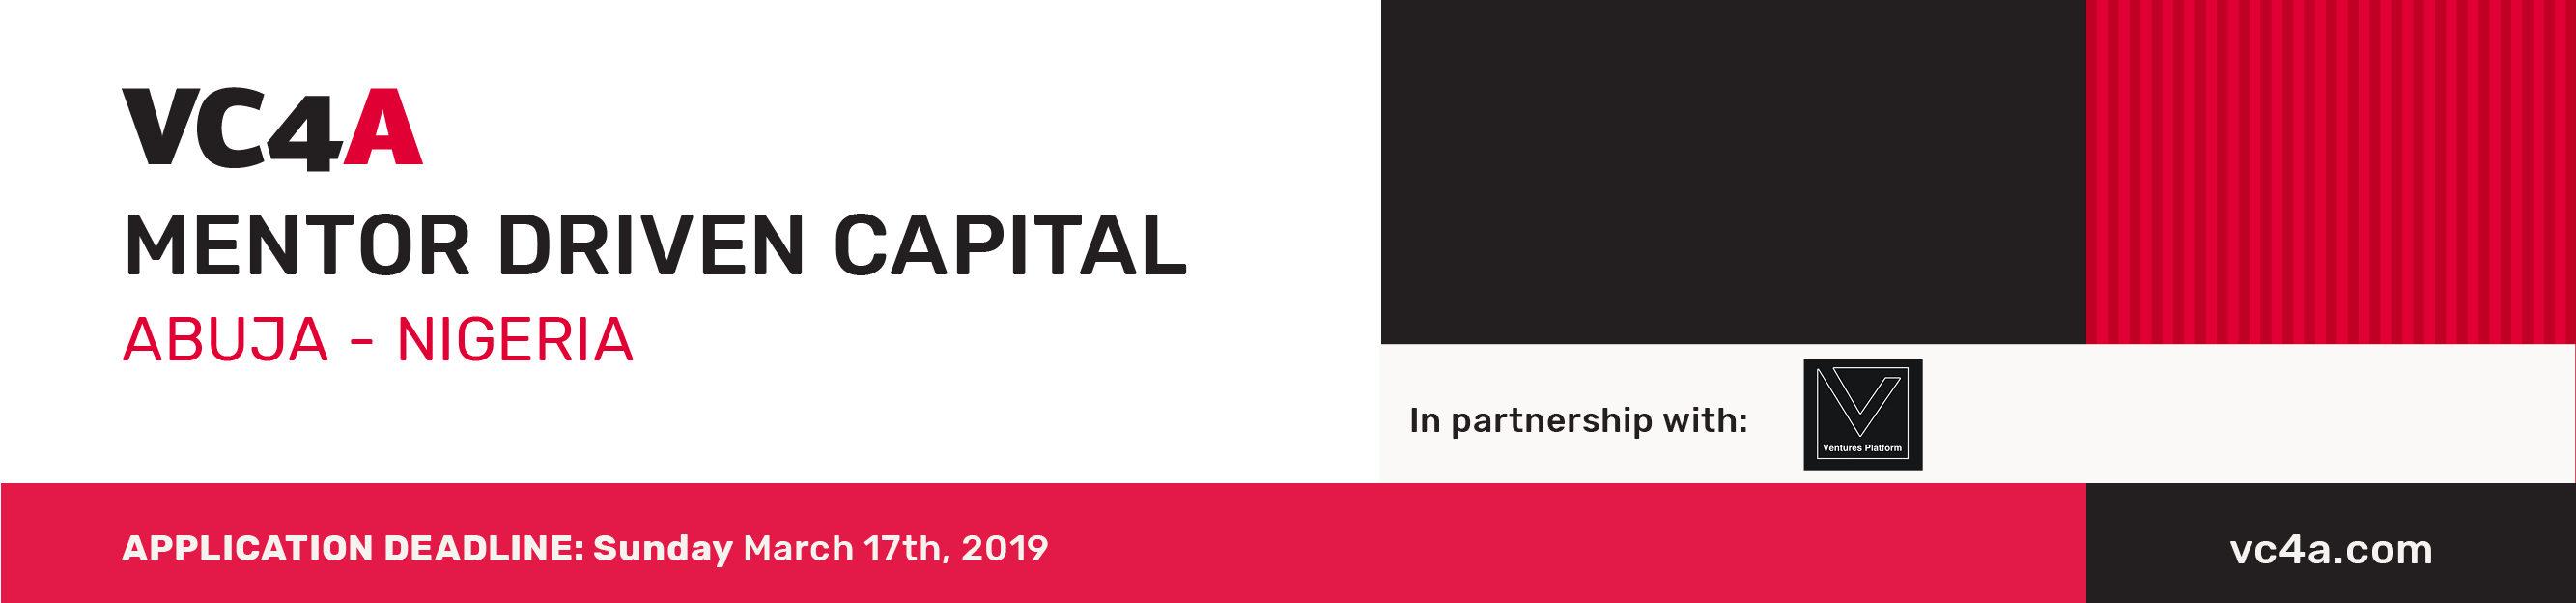 Mentor Driven Capital program Abuja 2019 – Call for mentors